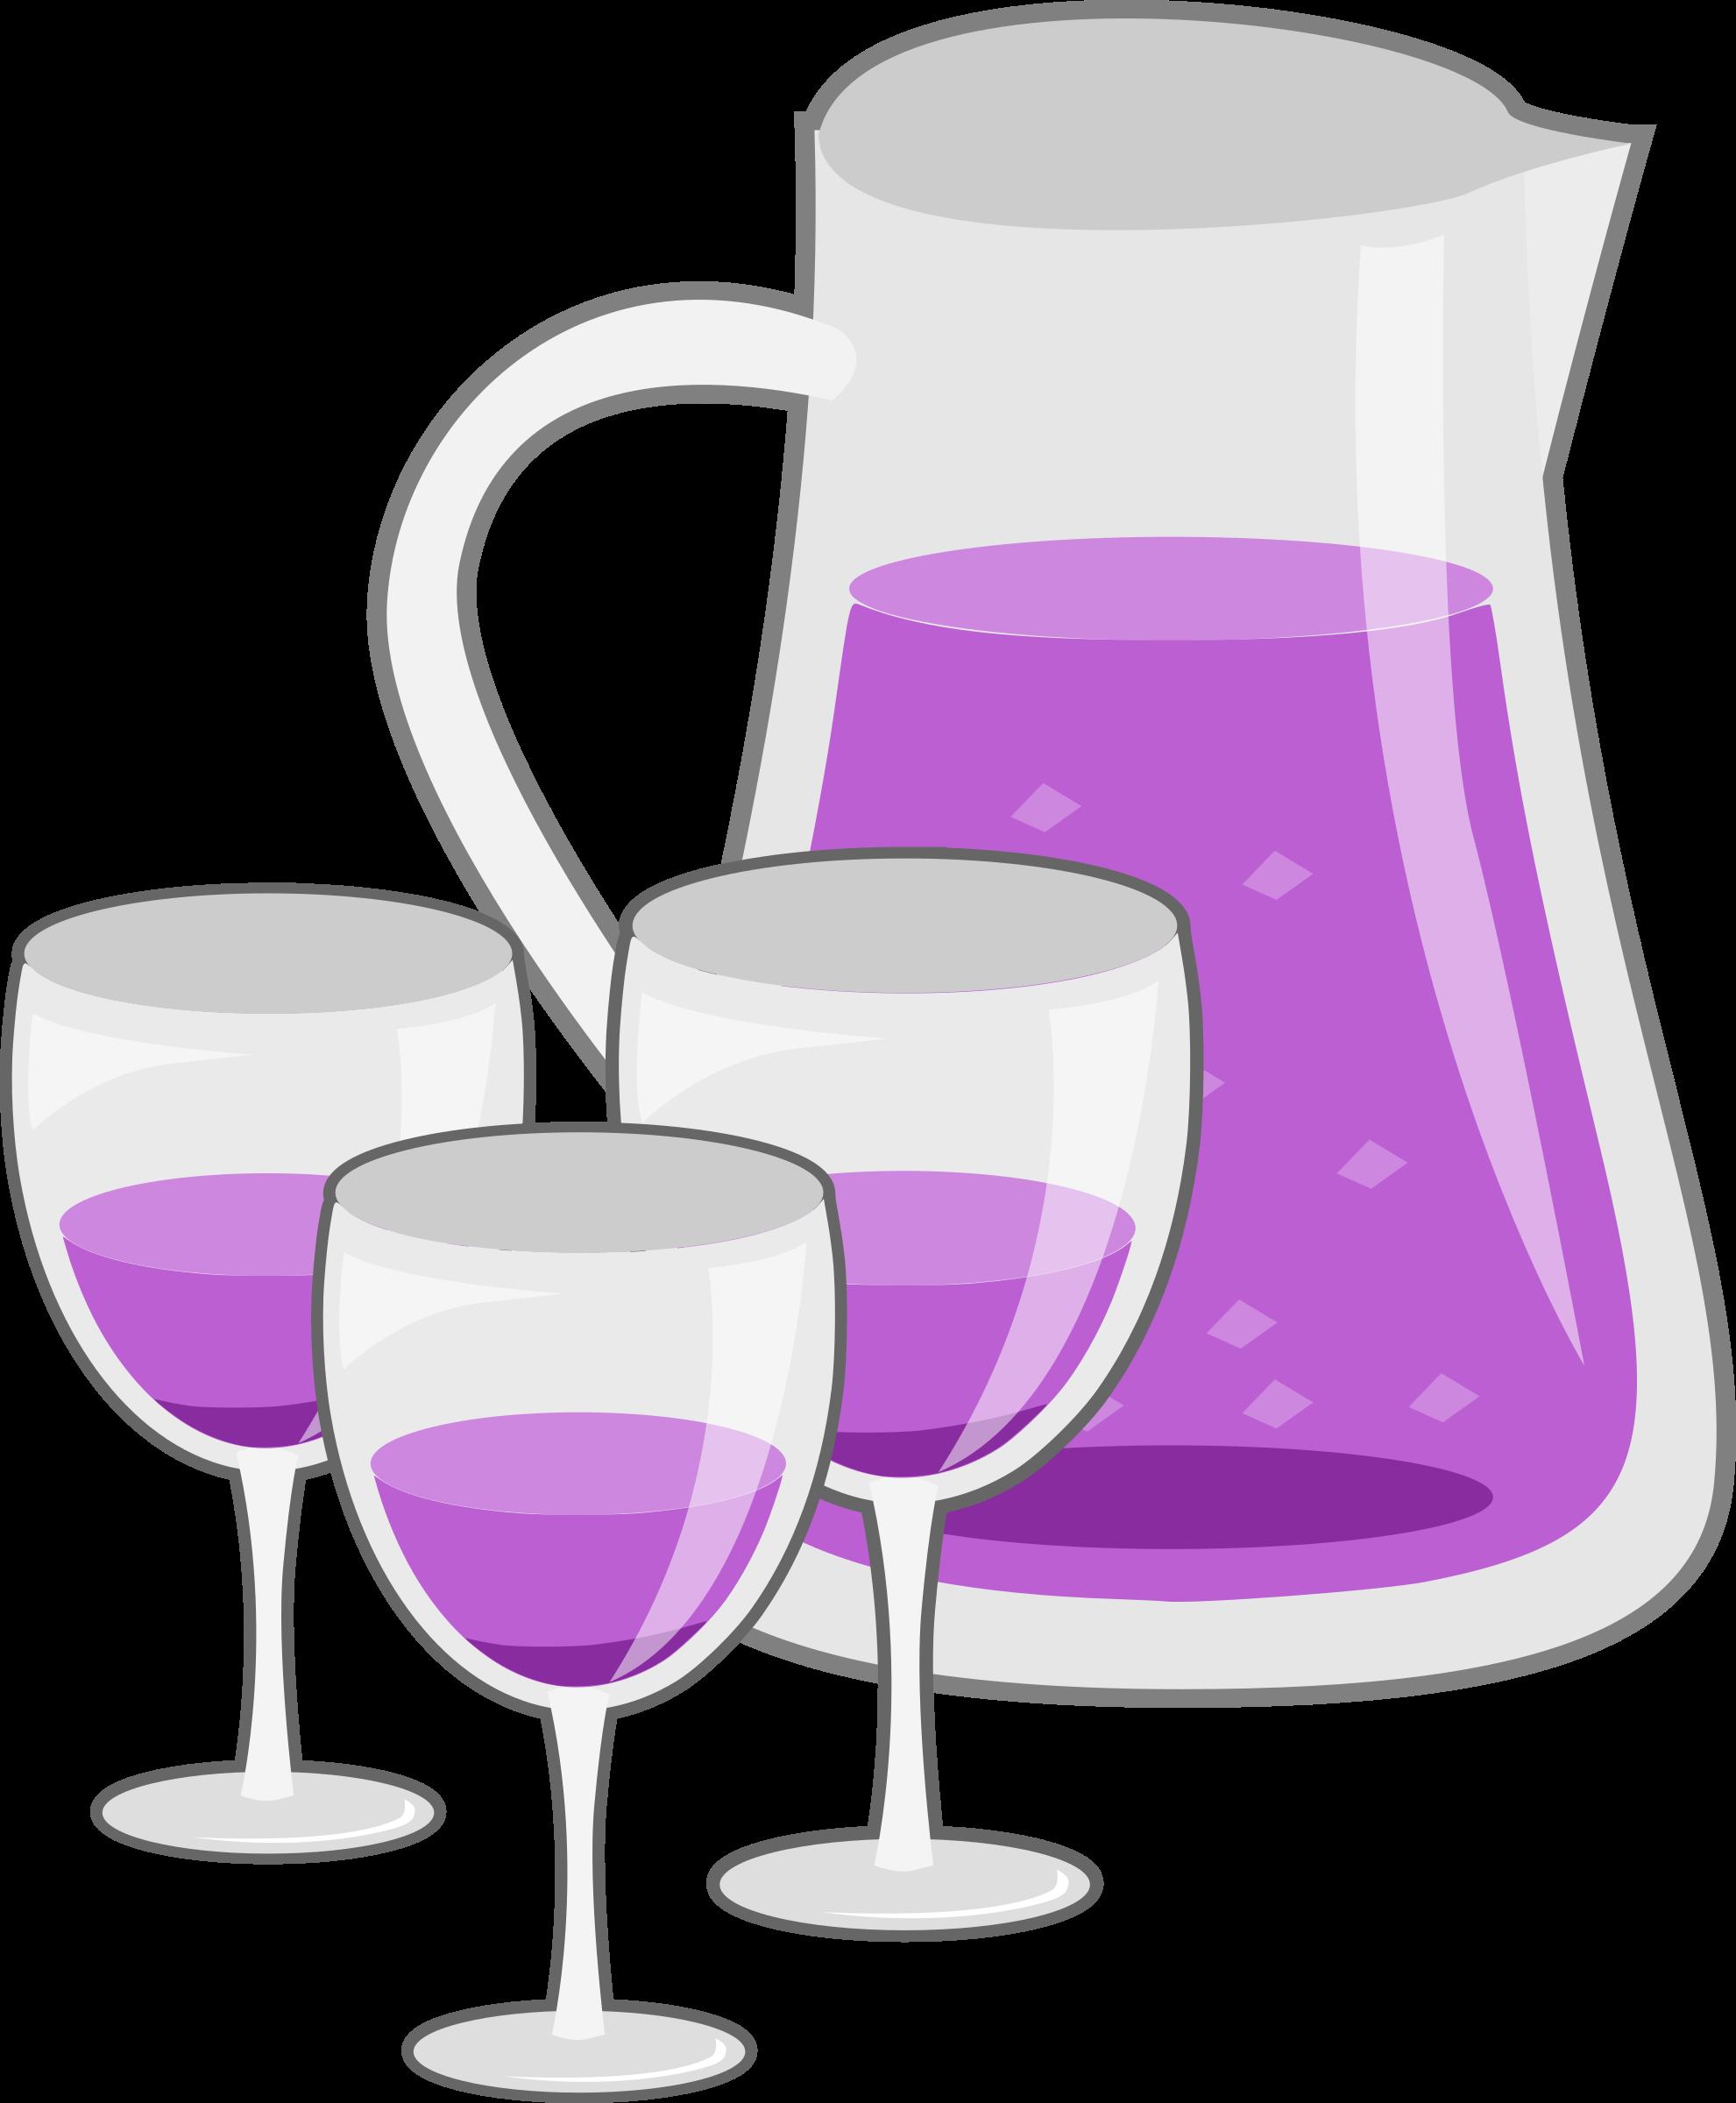 Drinking clipart purple wine. Drinks pitcher big image